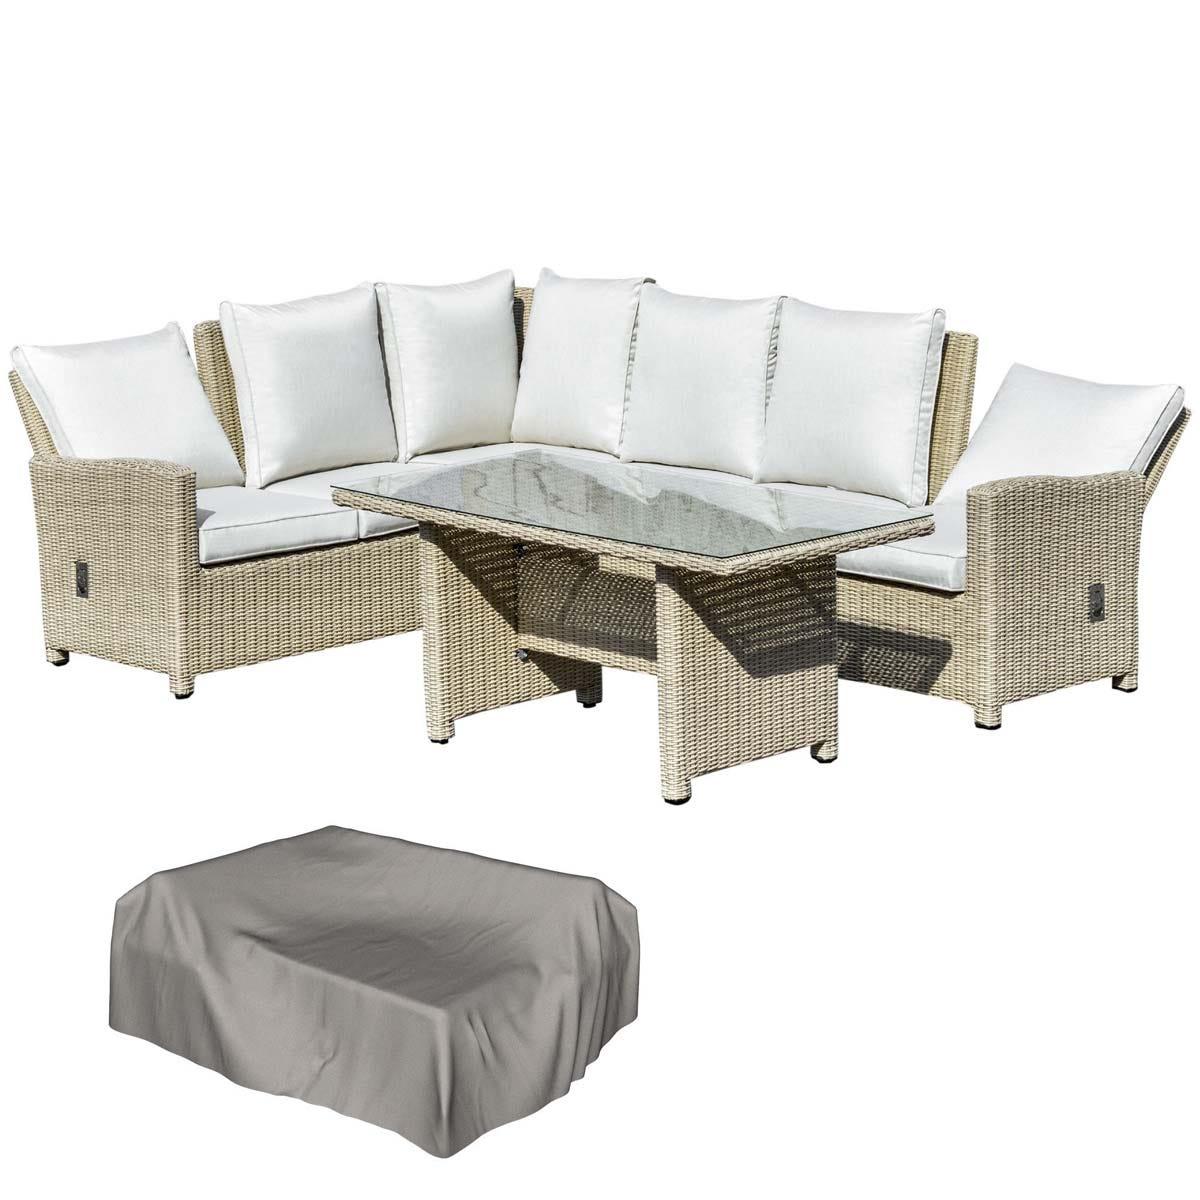 Outsunny 5 Piece Modular Rattan Corner Sofa Set with Cover - Natural